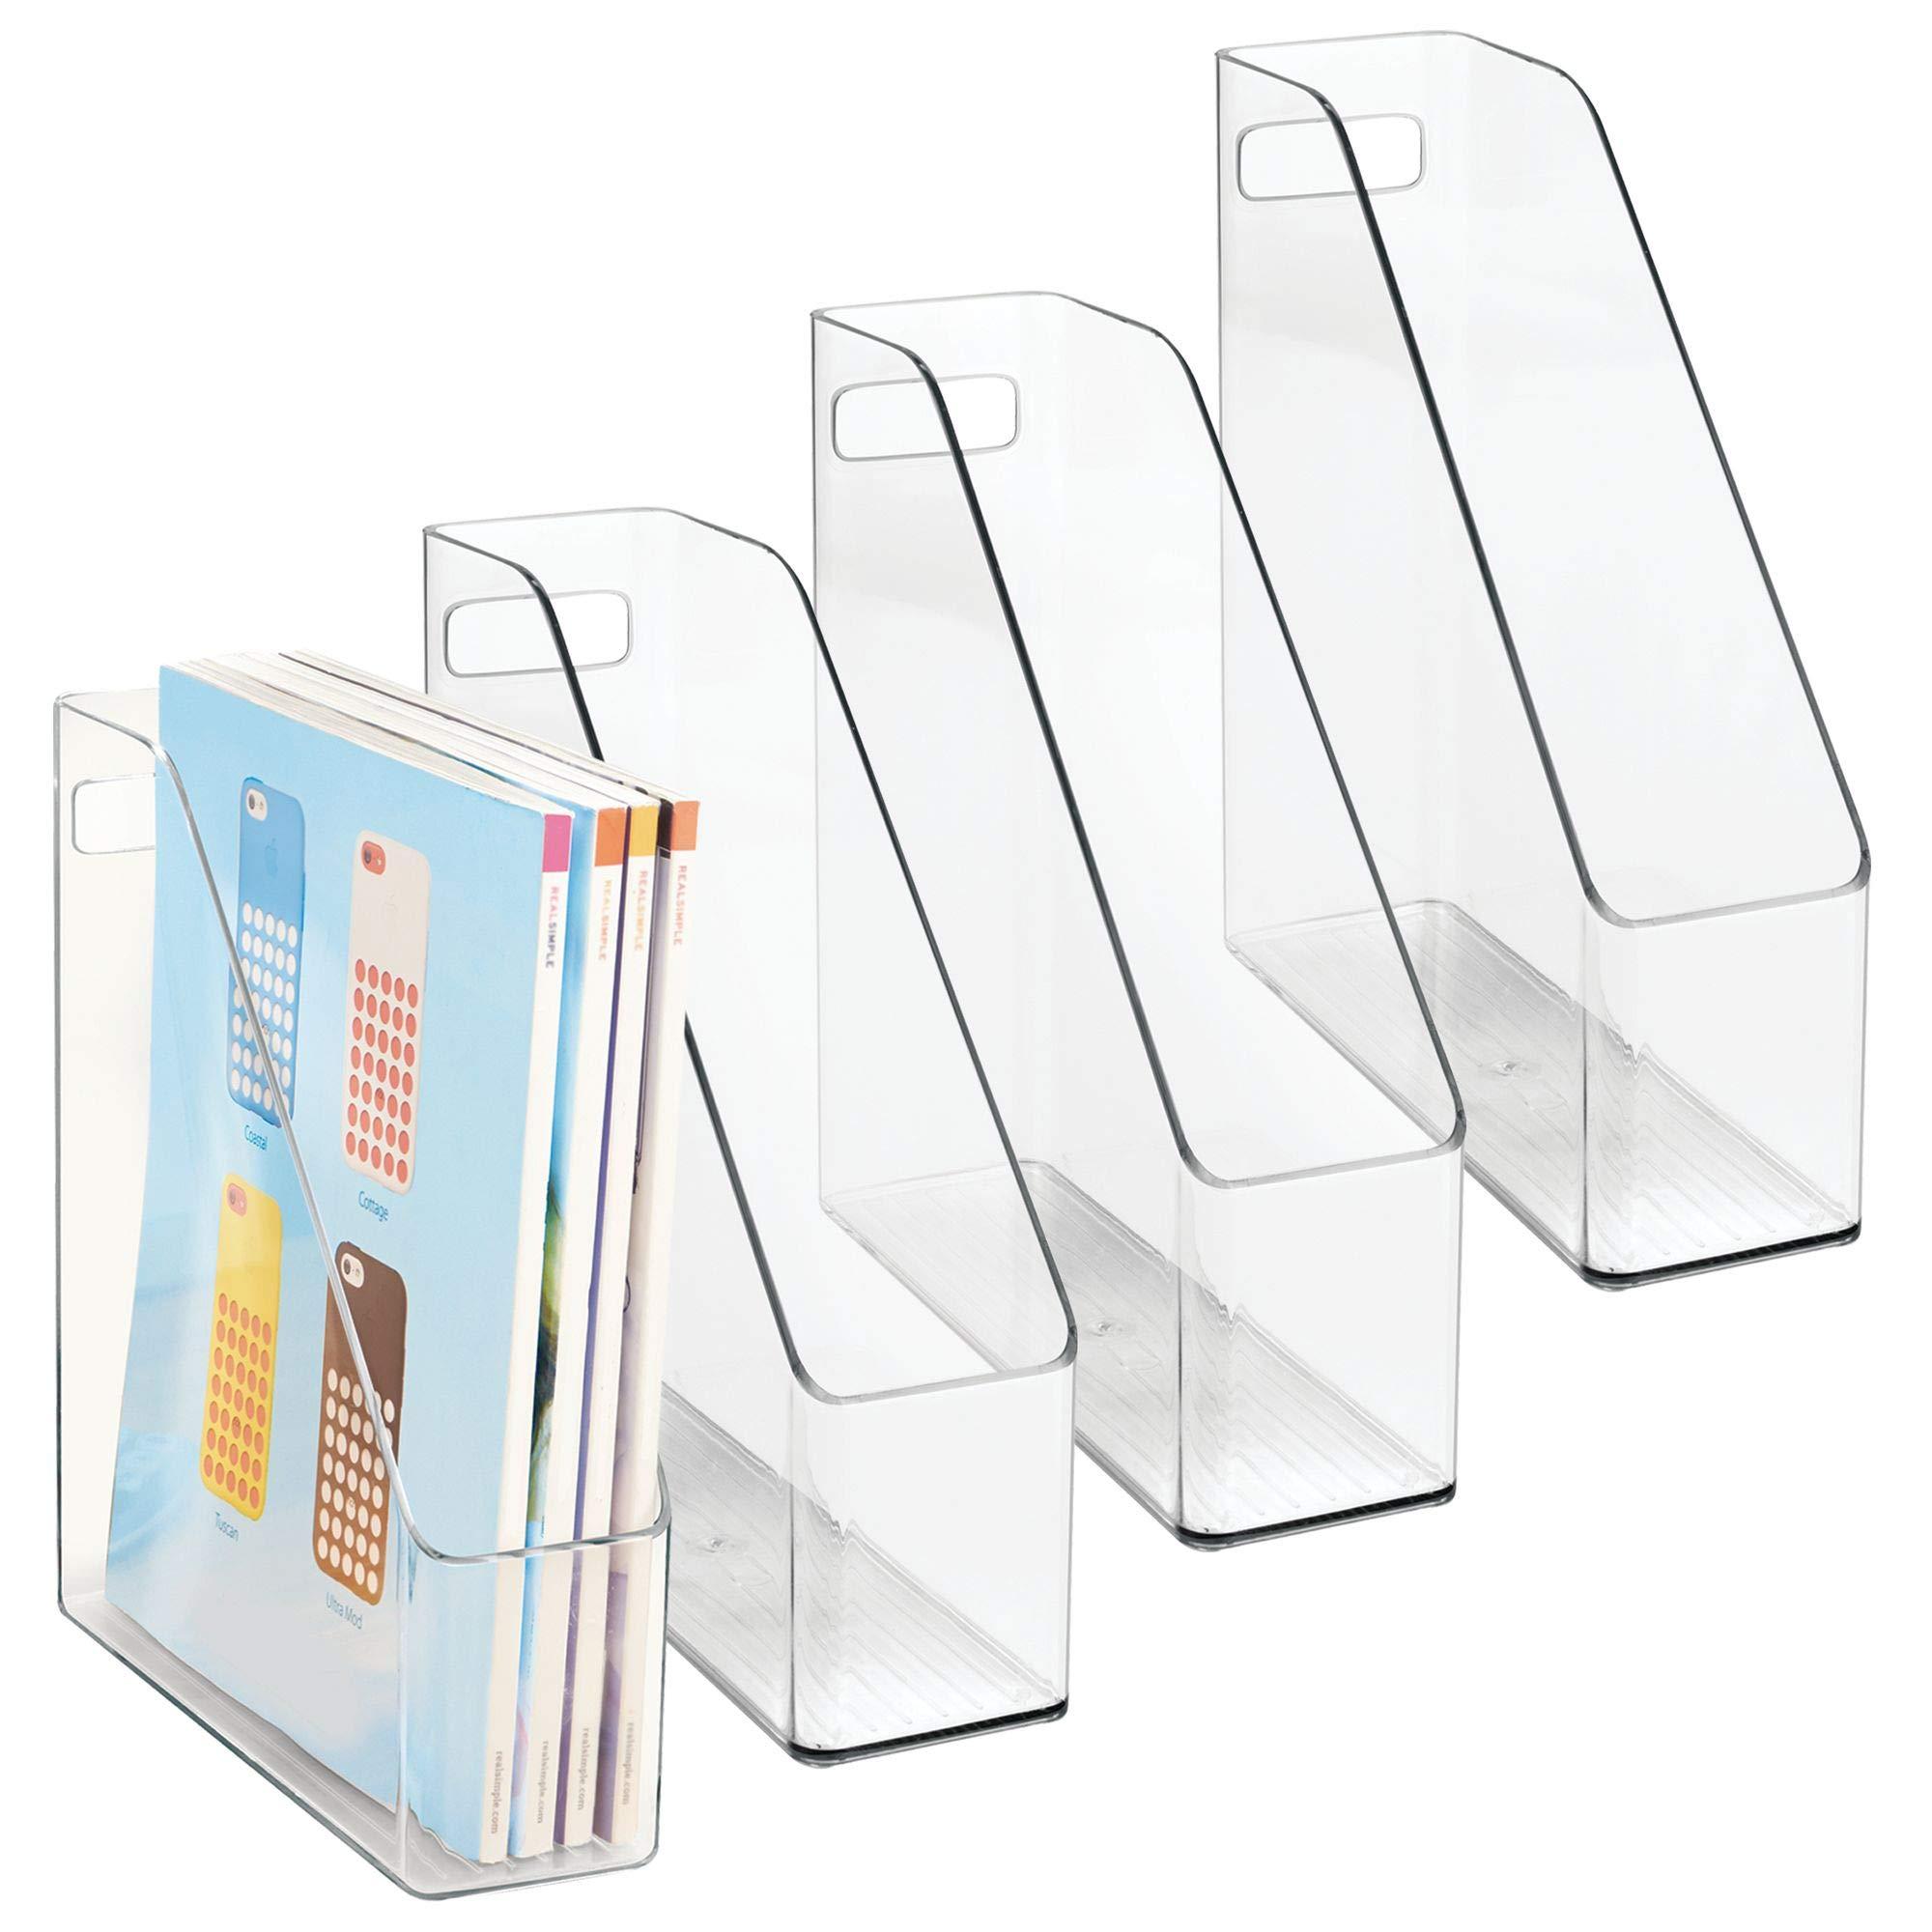 mDesign Plastic File Folder Holders Storage Organizer Set - Vertical with Handle - Holds Notebooks, Binders, Envelopes, Magazines - Home Office and Work Desktops, 4 Pack - Clear